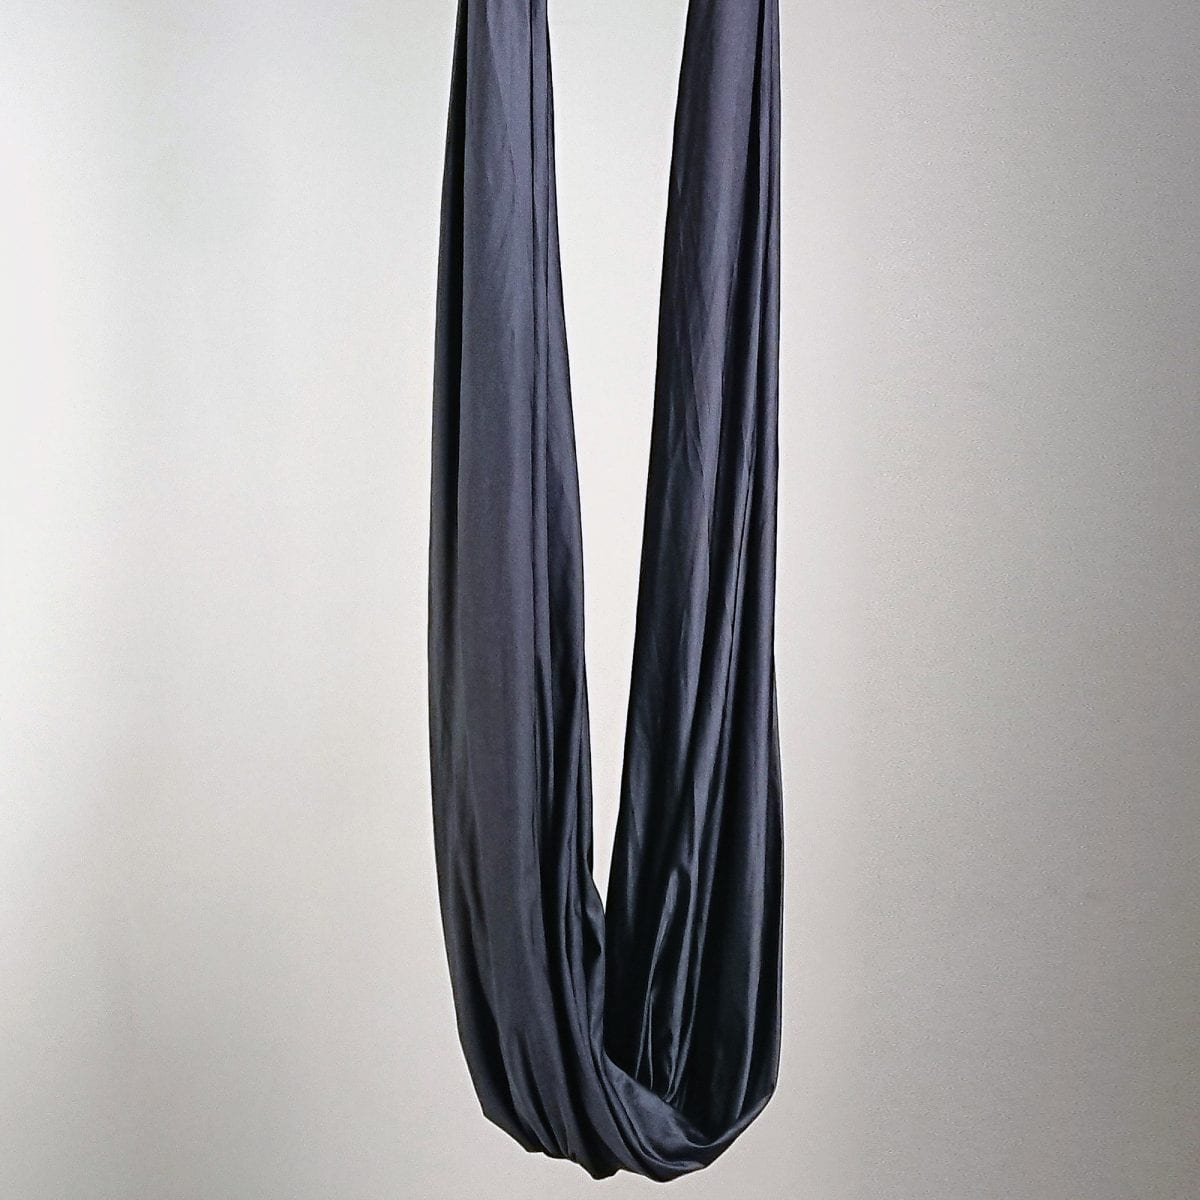 7bc561bee Aerial silks antigravity to make yoga hammocks and aerial sling ...